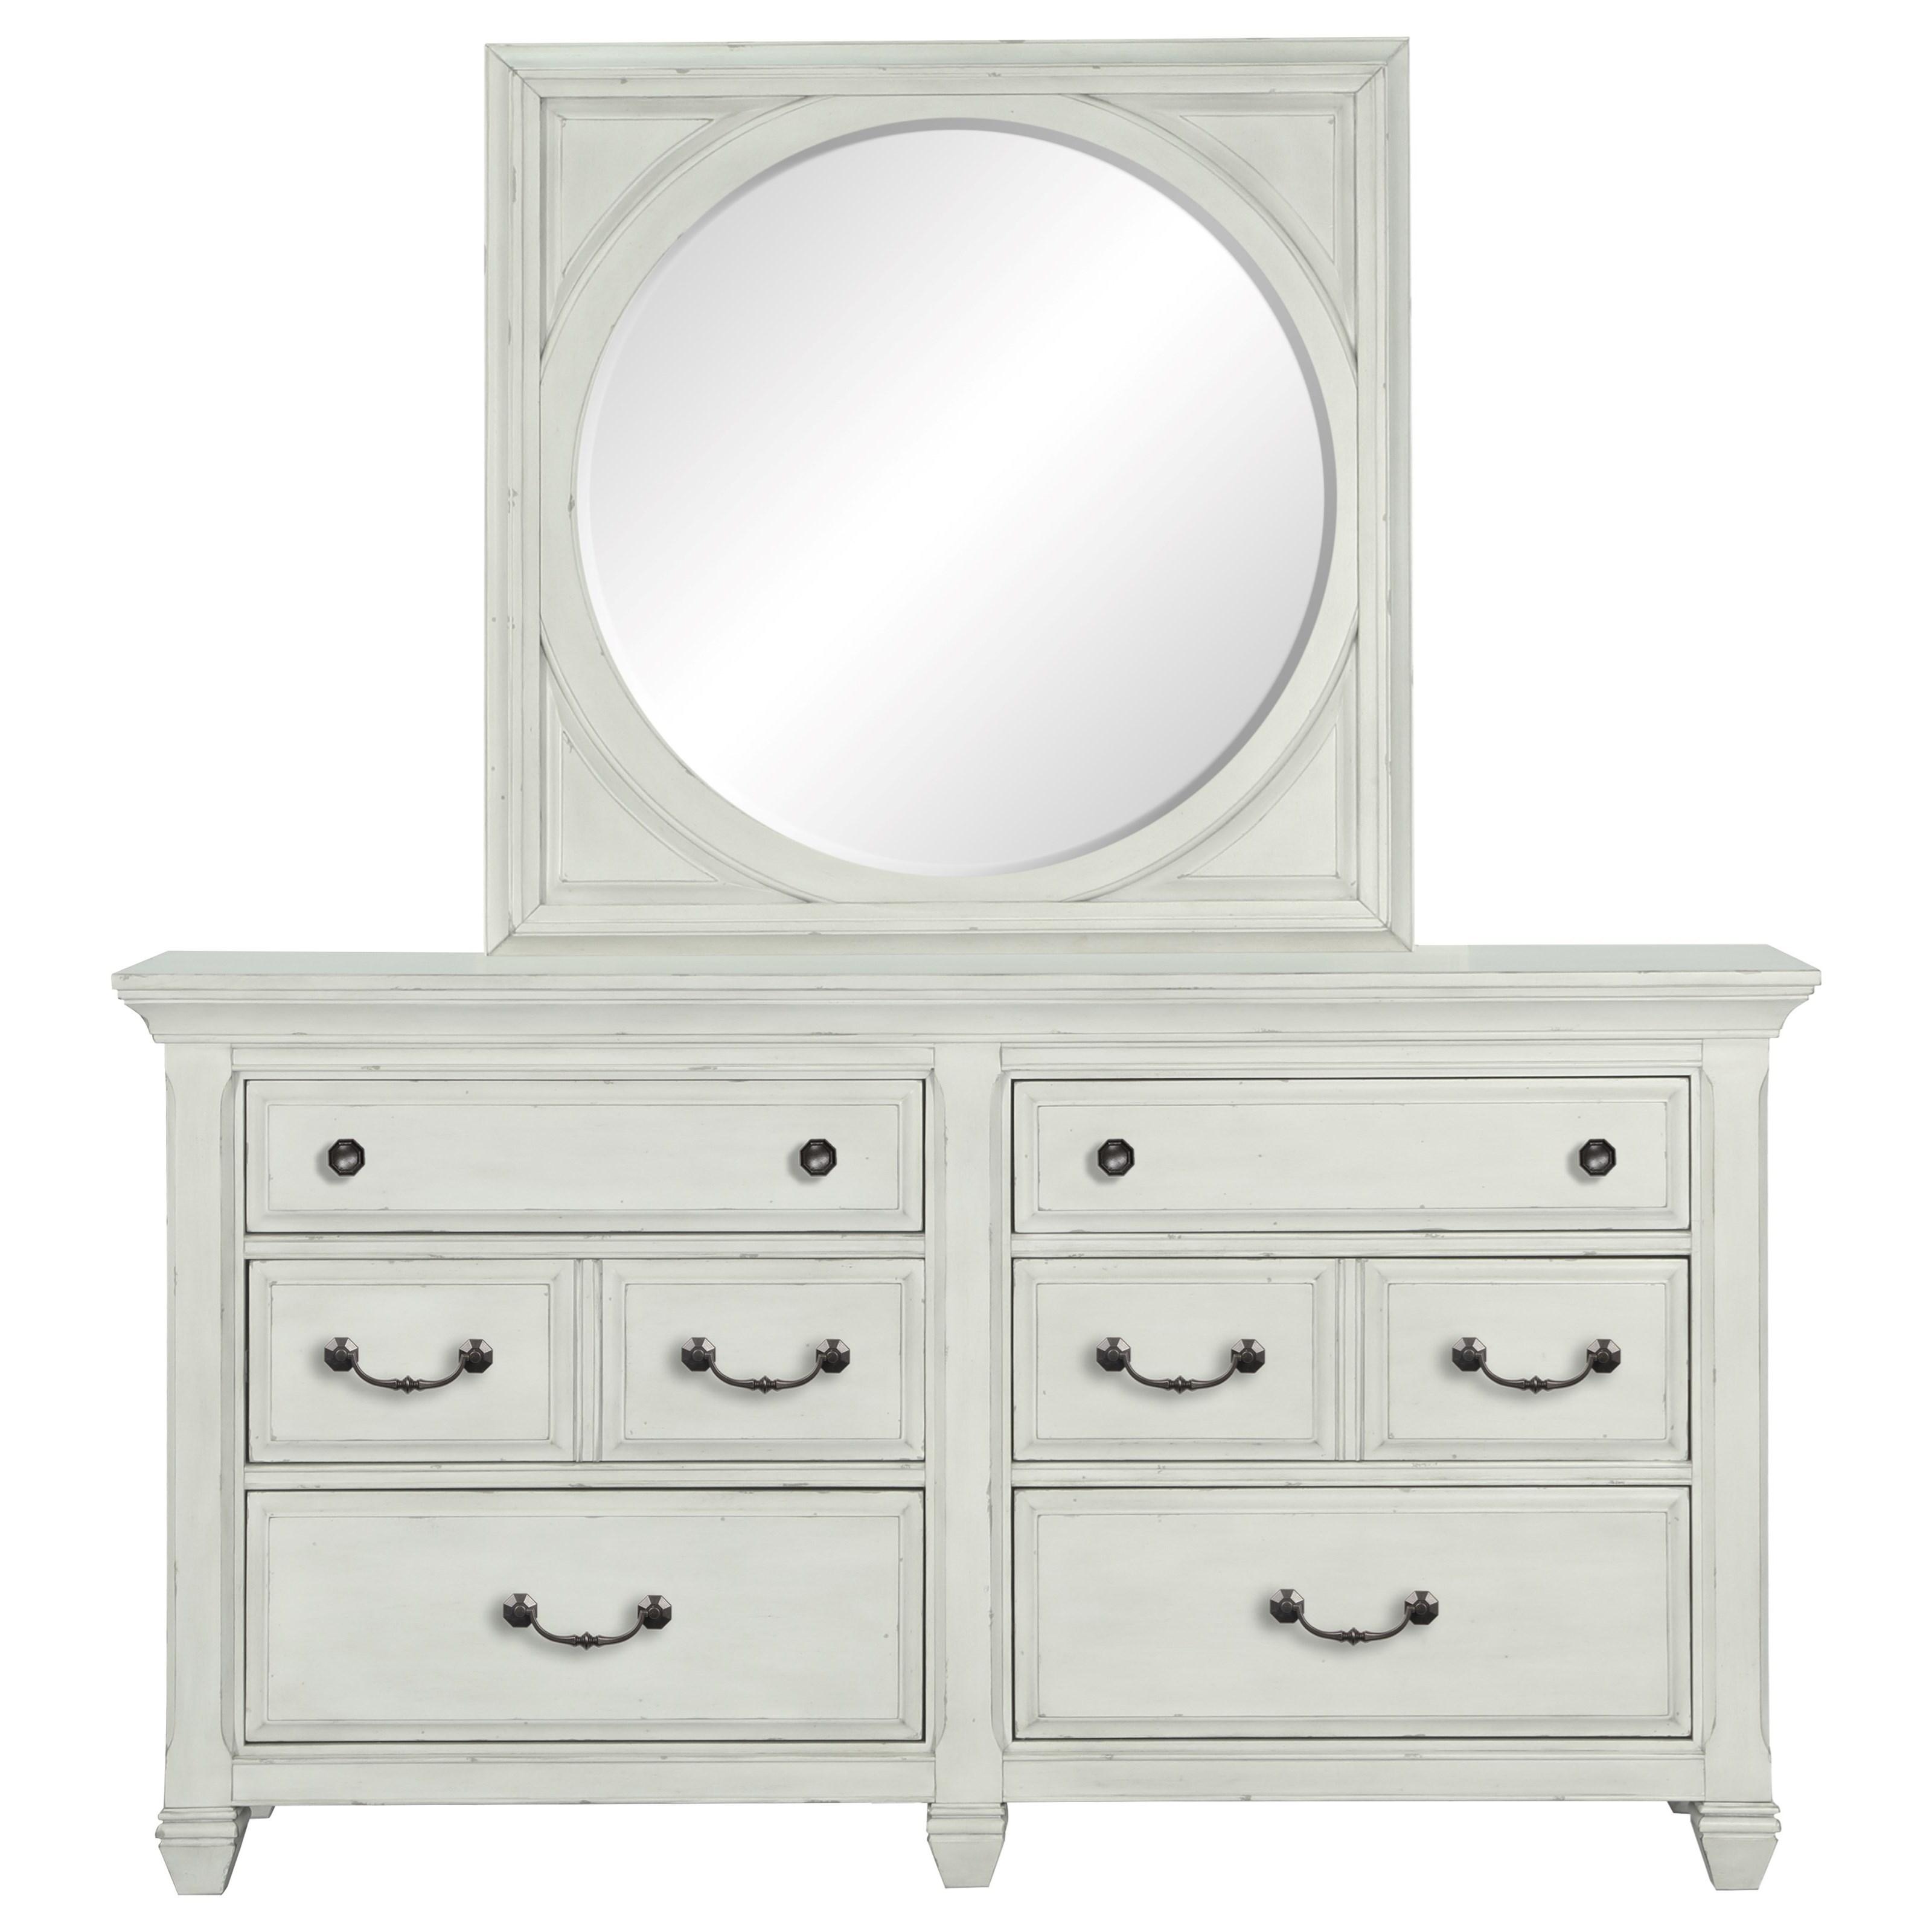 Belfort Select Magnolia Park Dresser and Mirror Set - Item Number: B3681-20+B3681-41